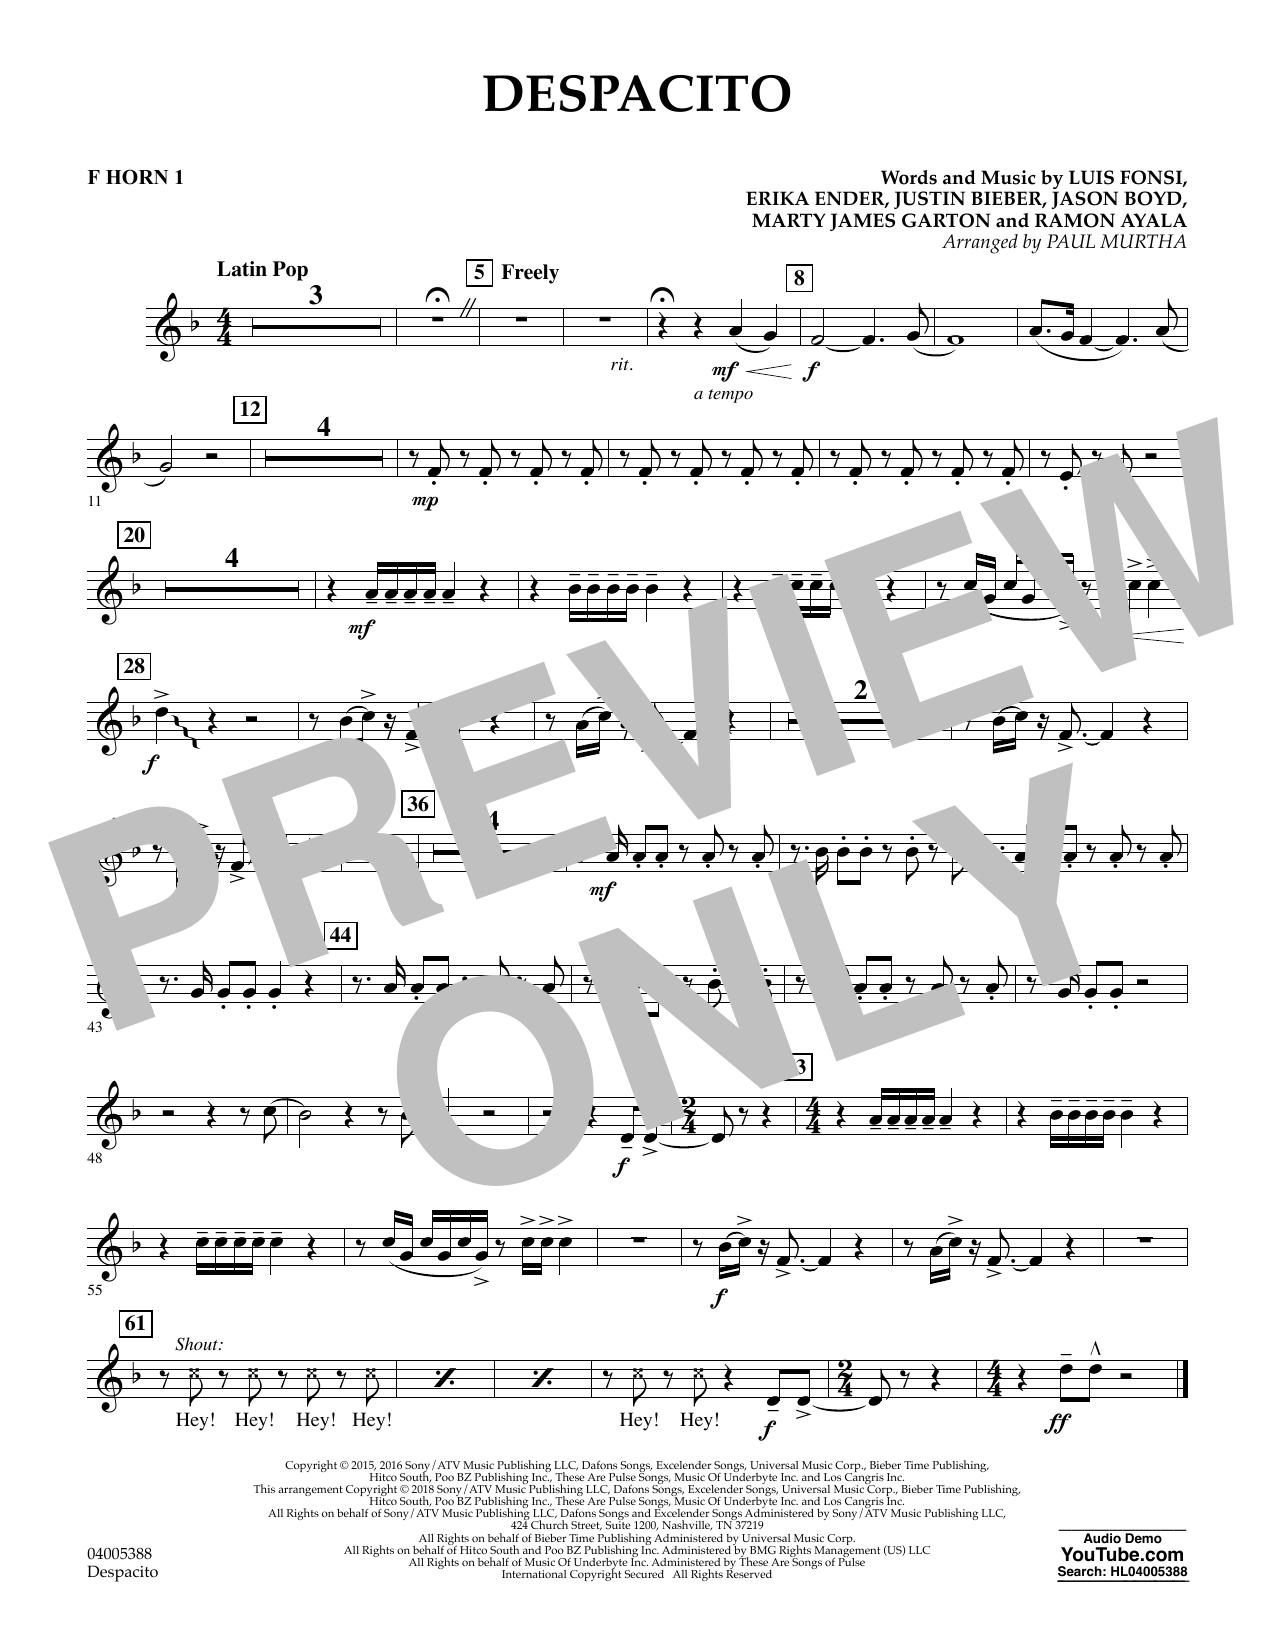 Despacito (arr. Paul Murtha) - F Horn 1 (Concert Band)